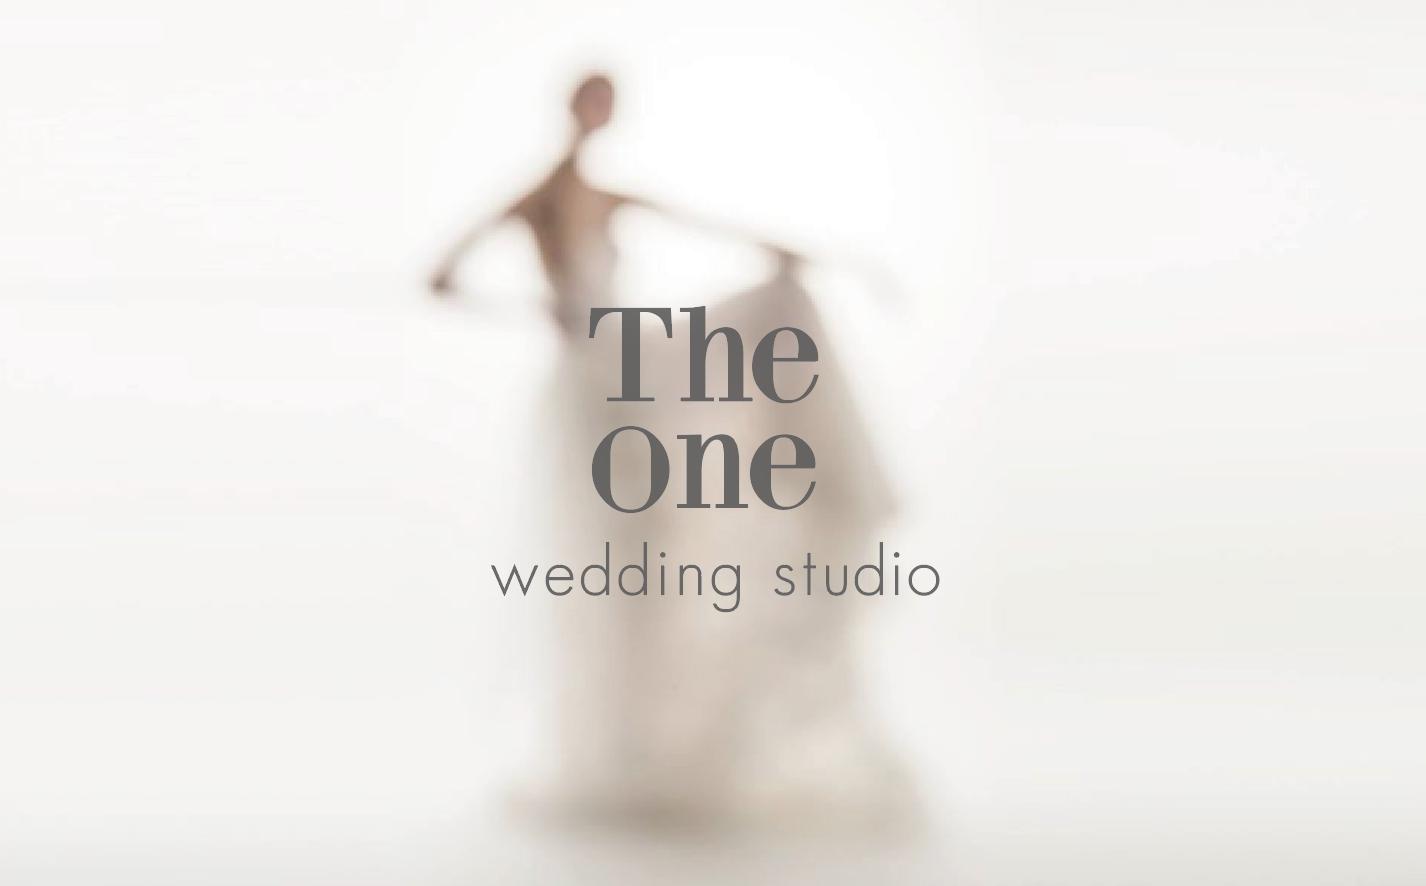 The One wedding 工作室